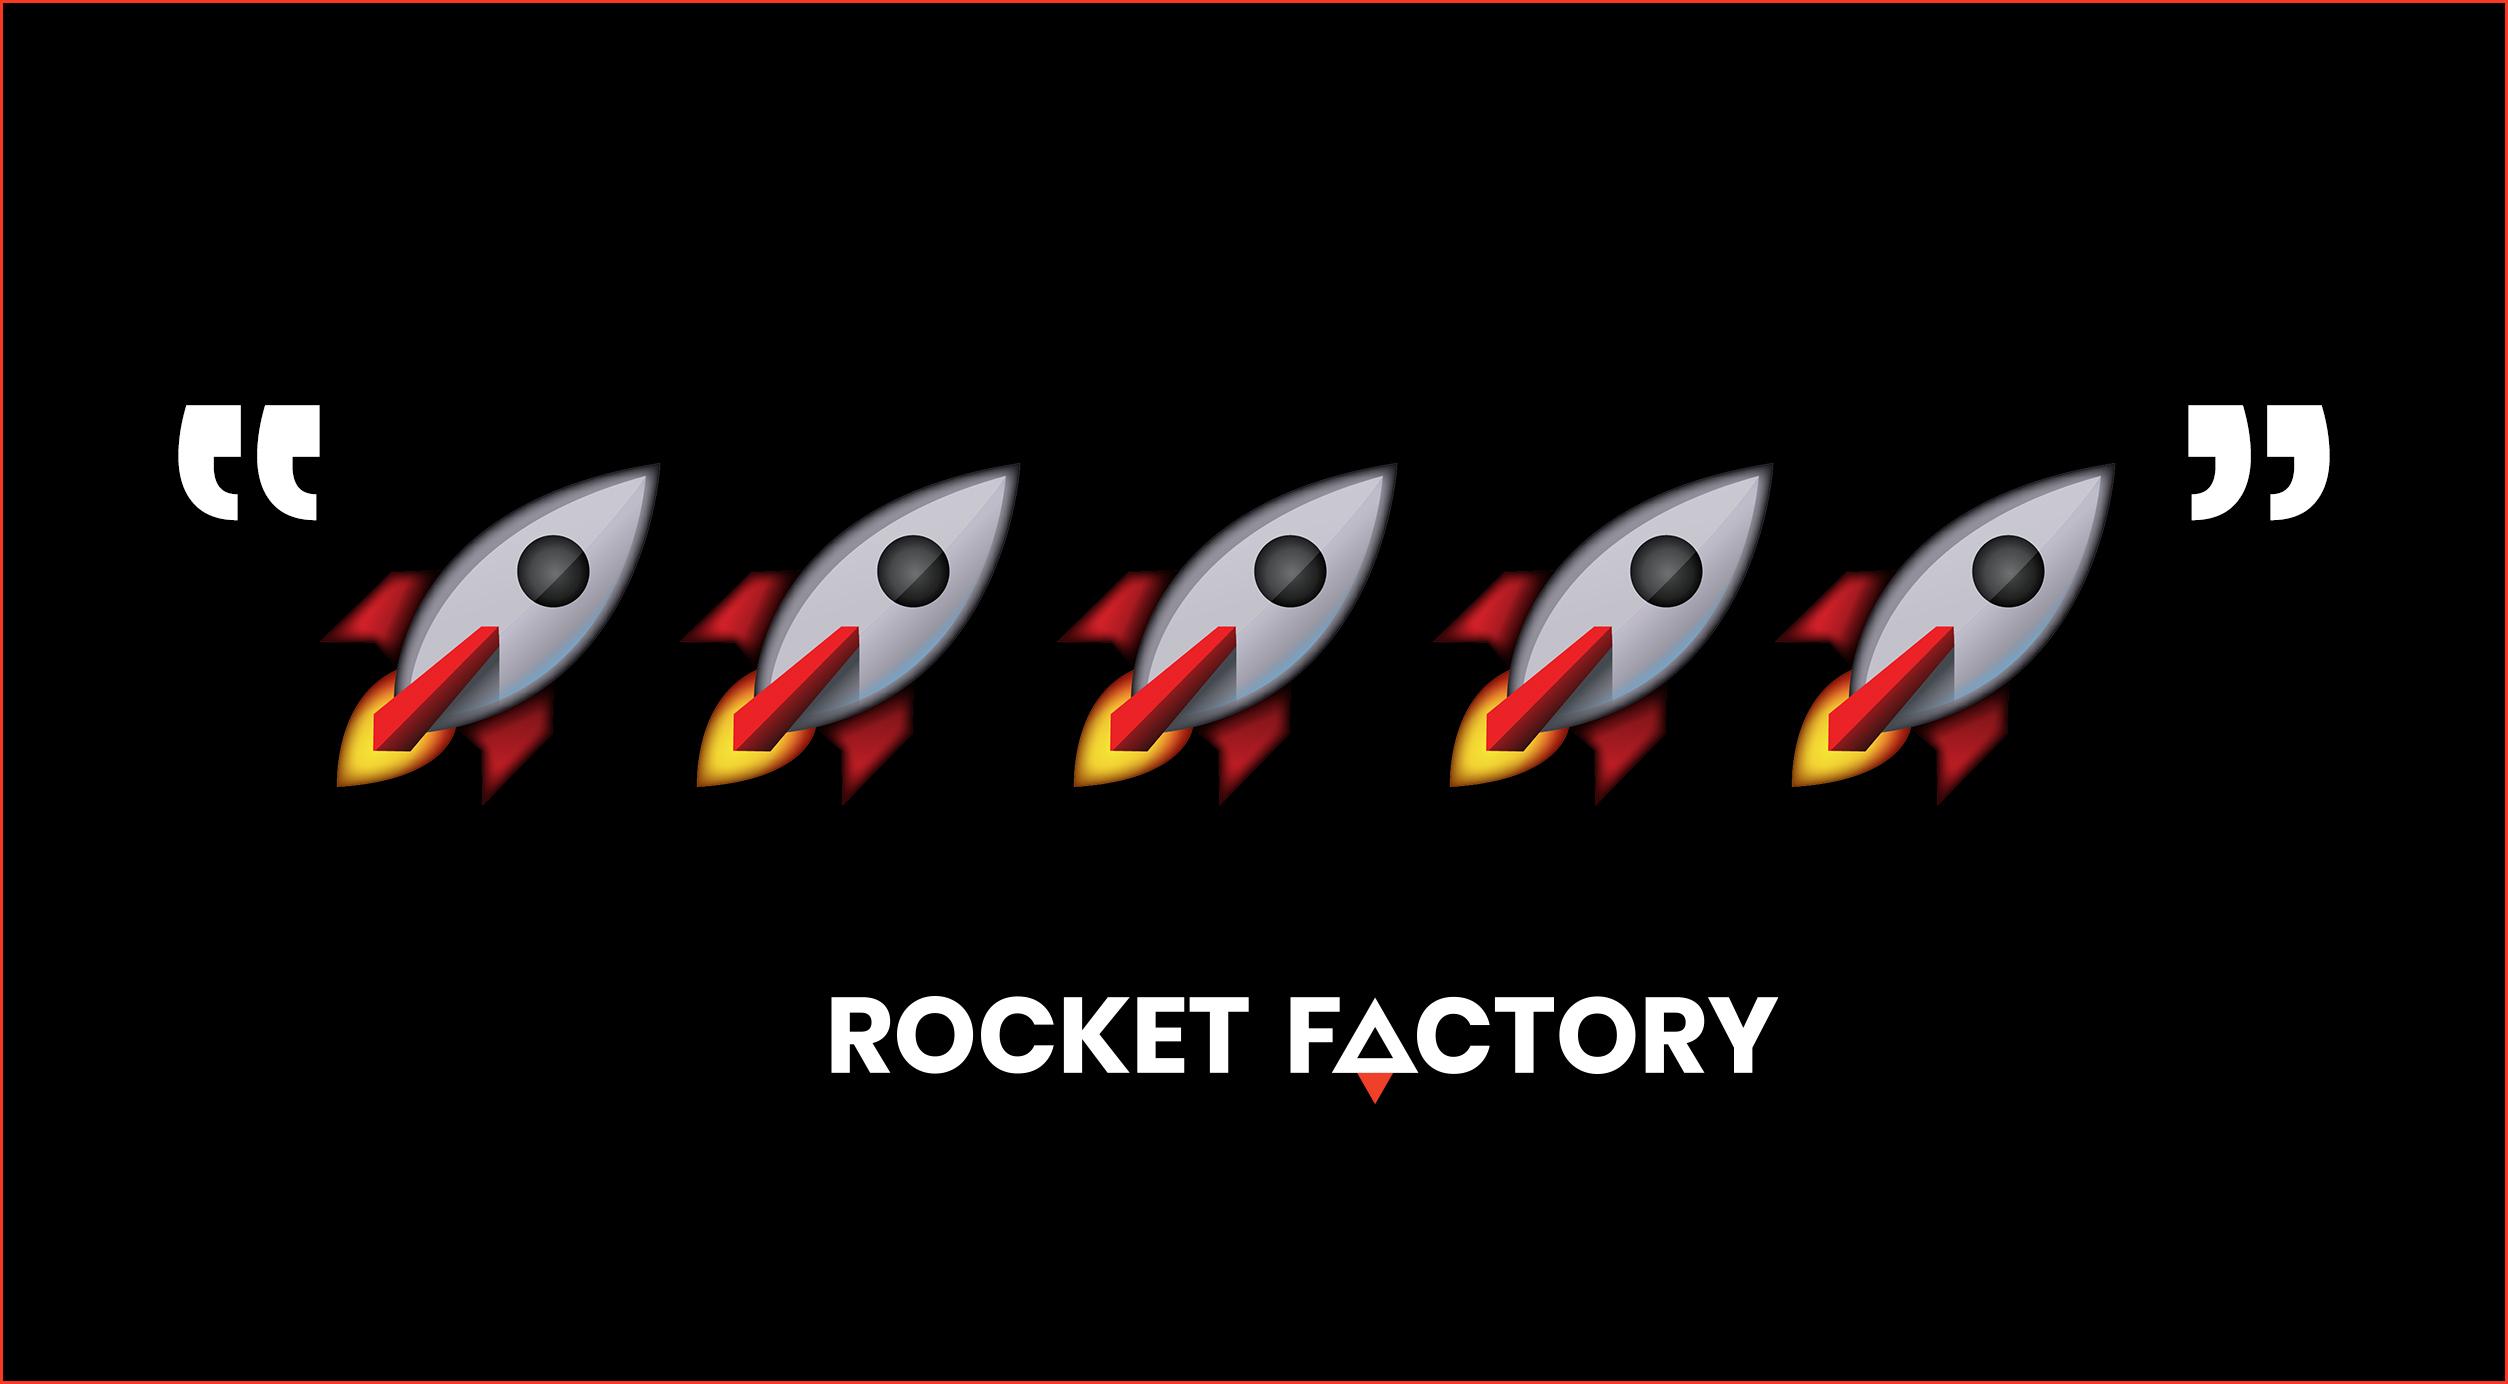 5 Rockets